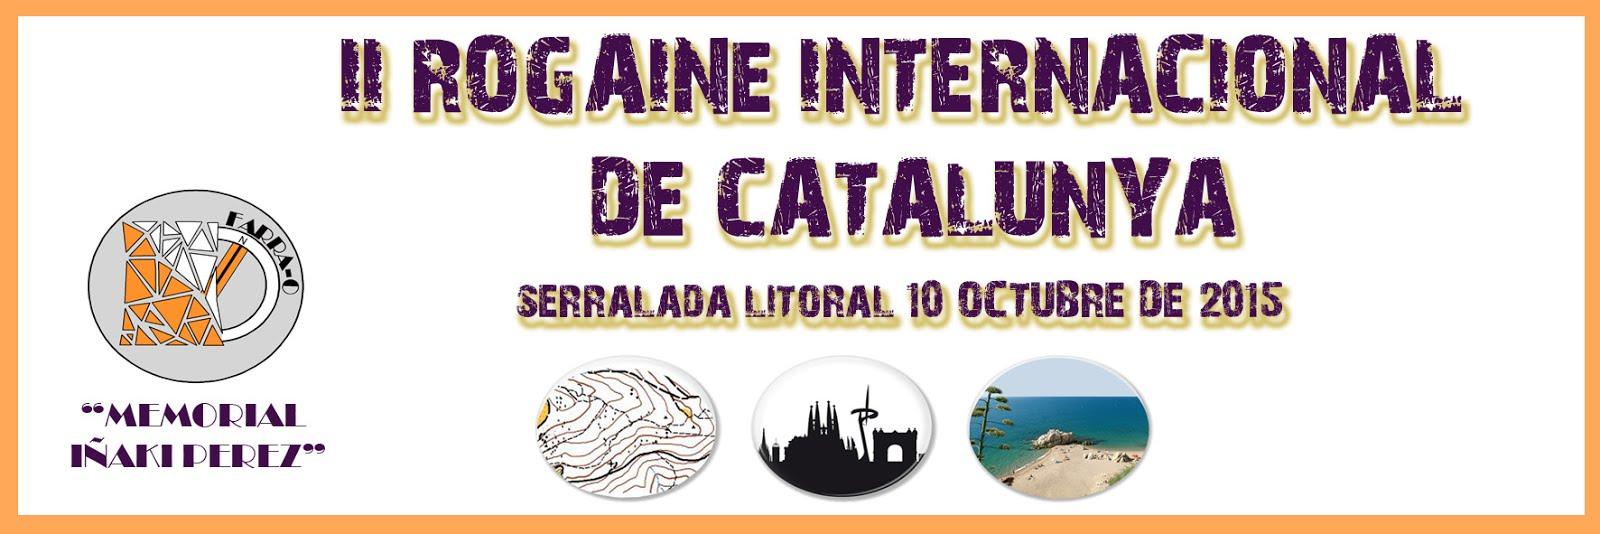 "10 OCTUBRE - II ROGAINE INTERNACIONAL 12h DE CATALUNYA ""Memorial Iñaki Pérez"""